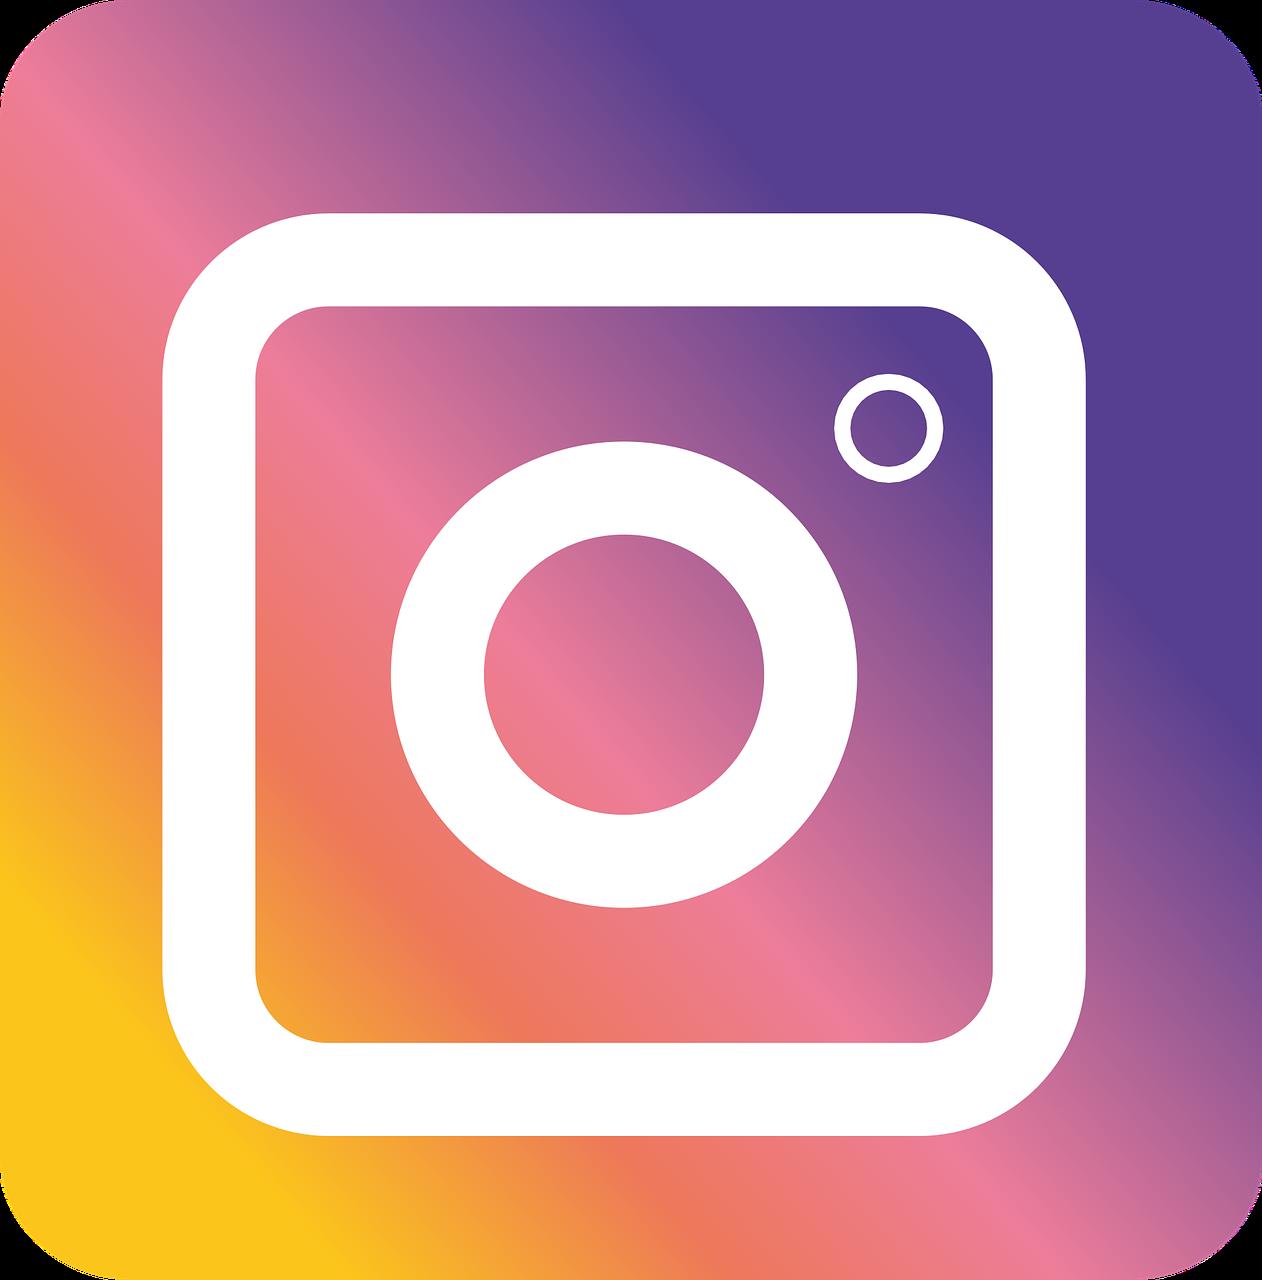 instagram, insta logo, new images